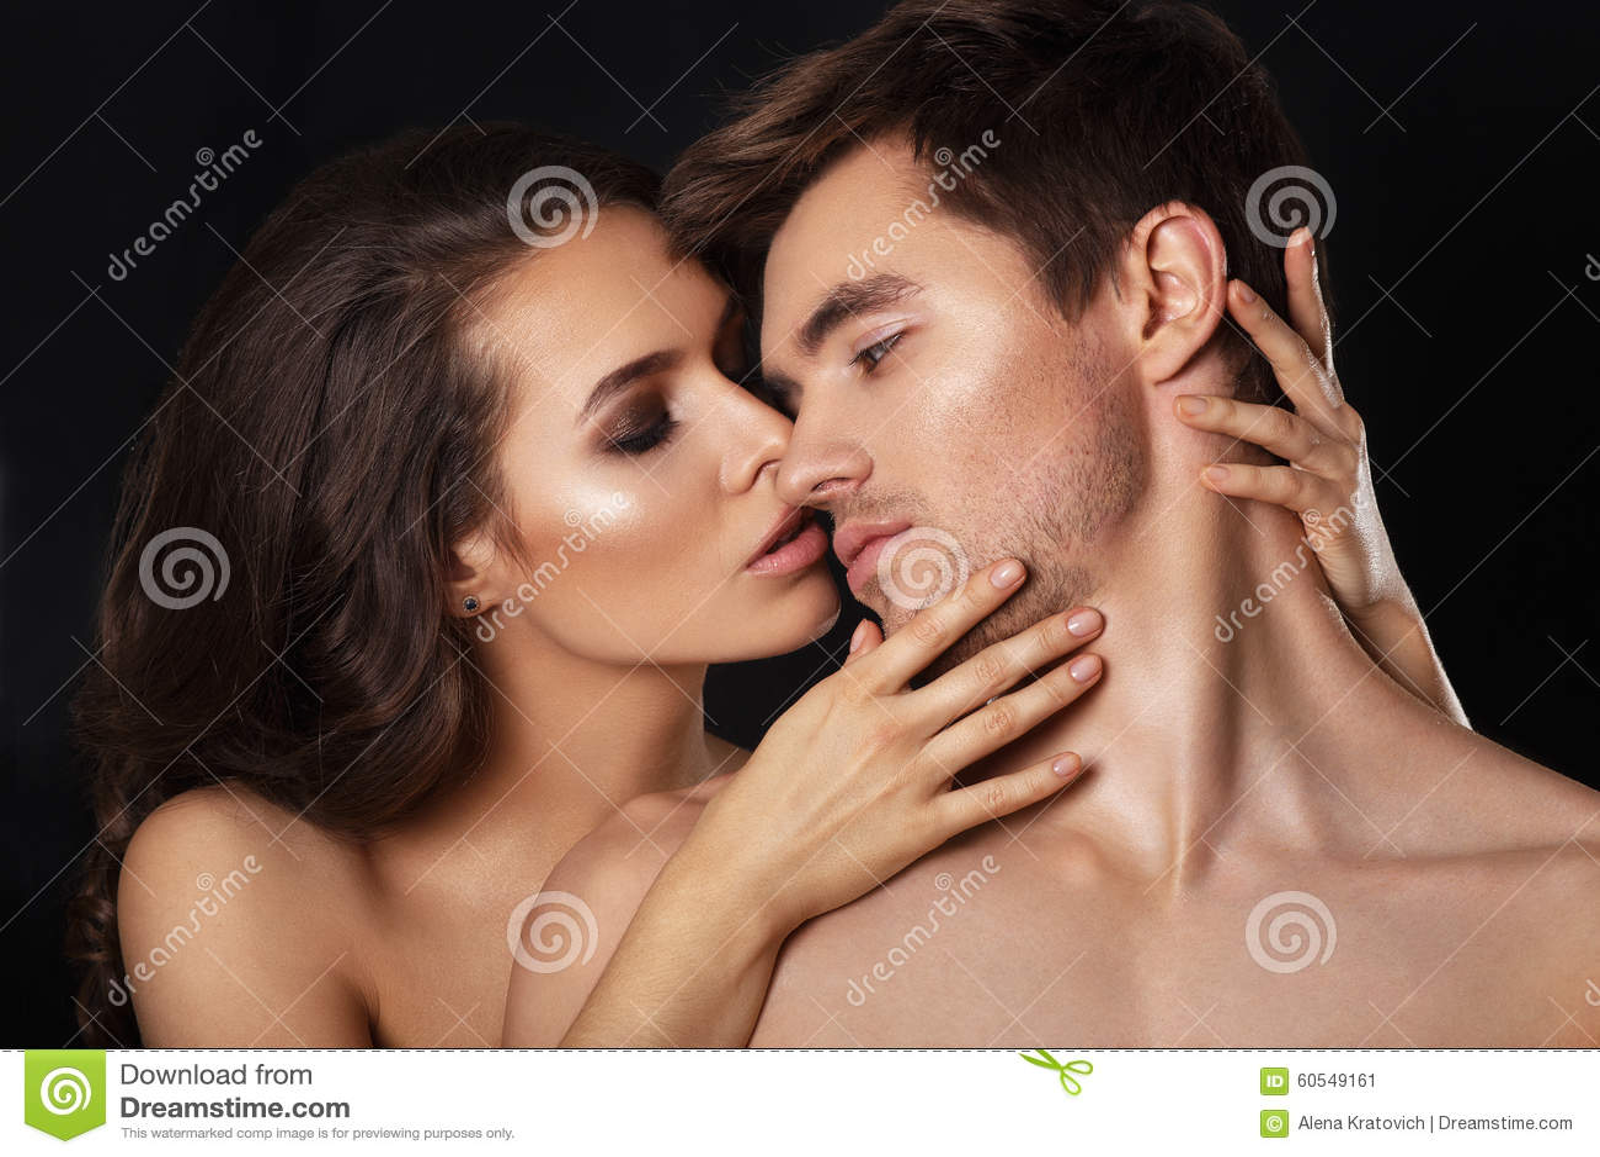 White Black Lesbians Kissing